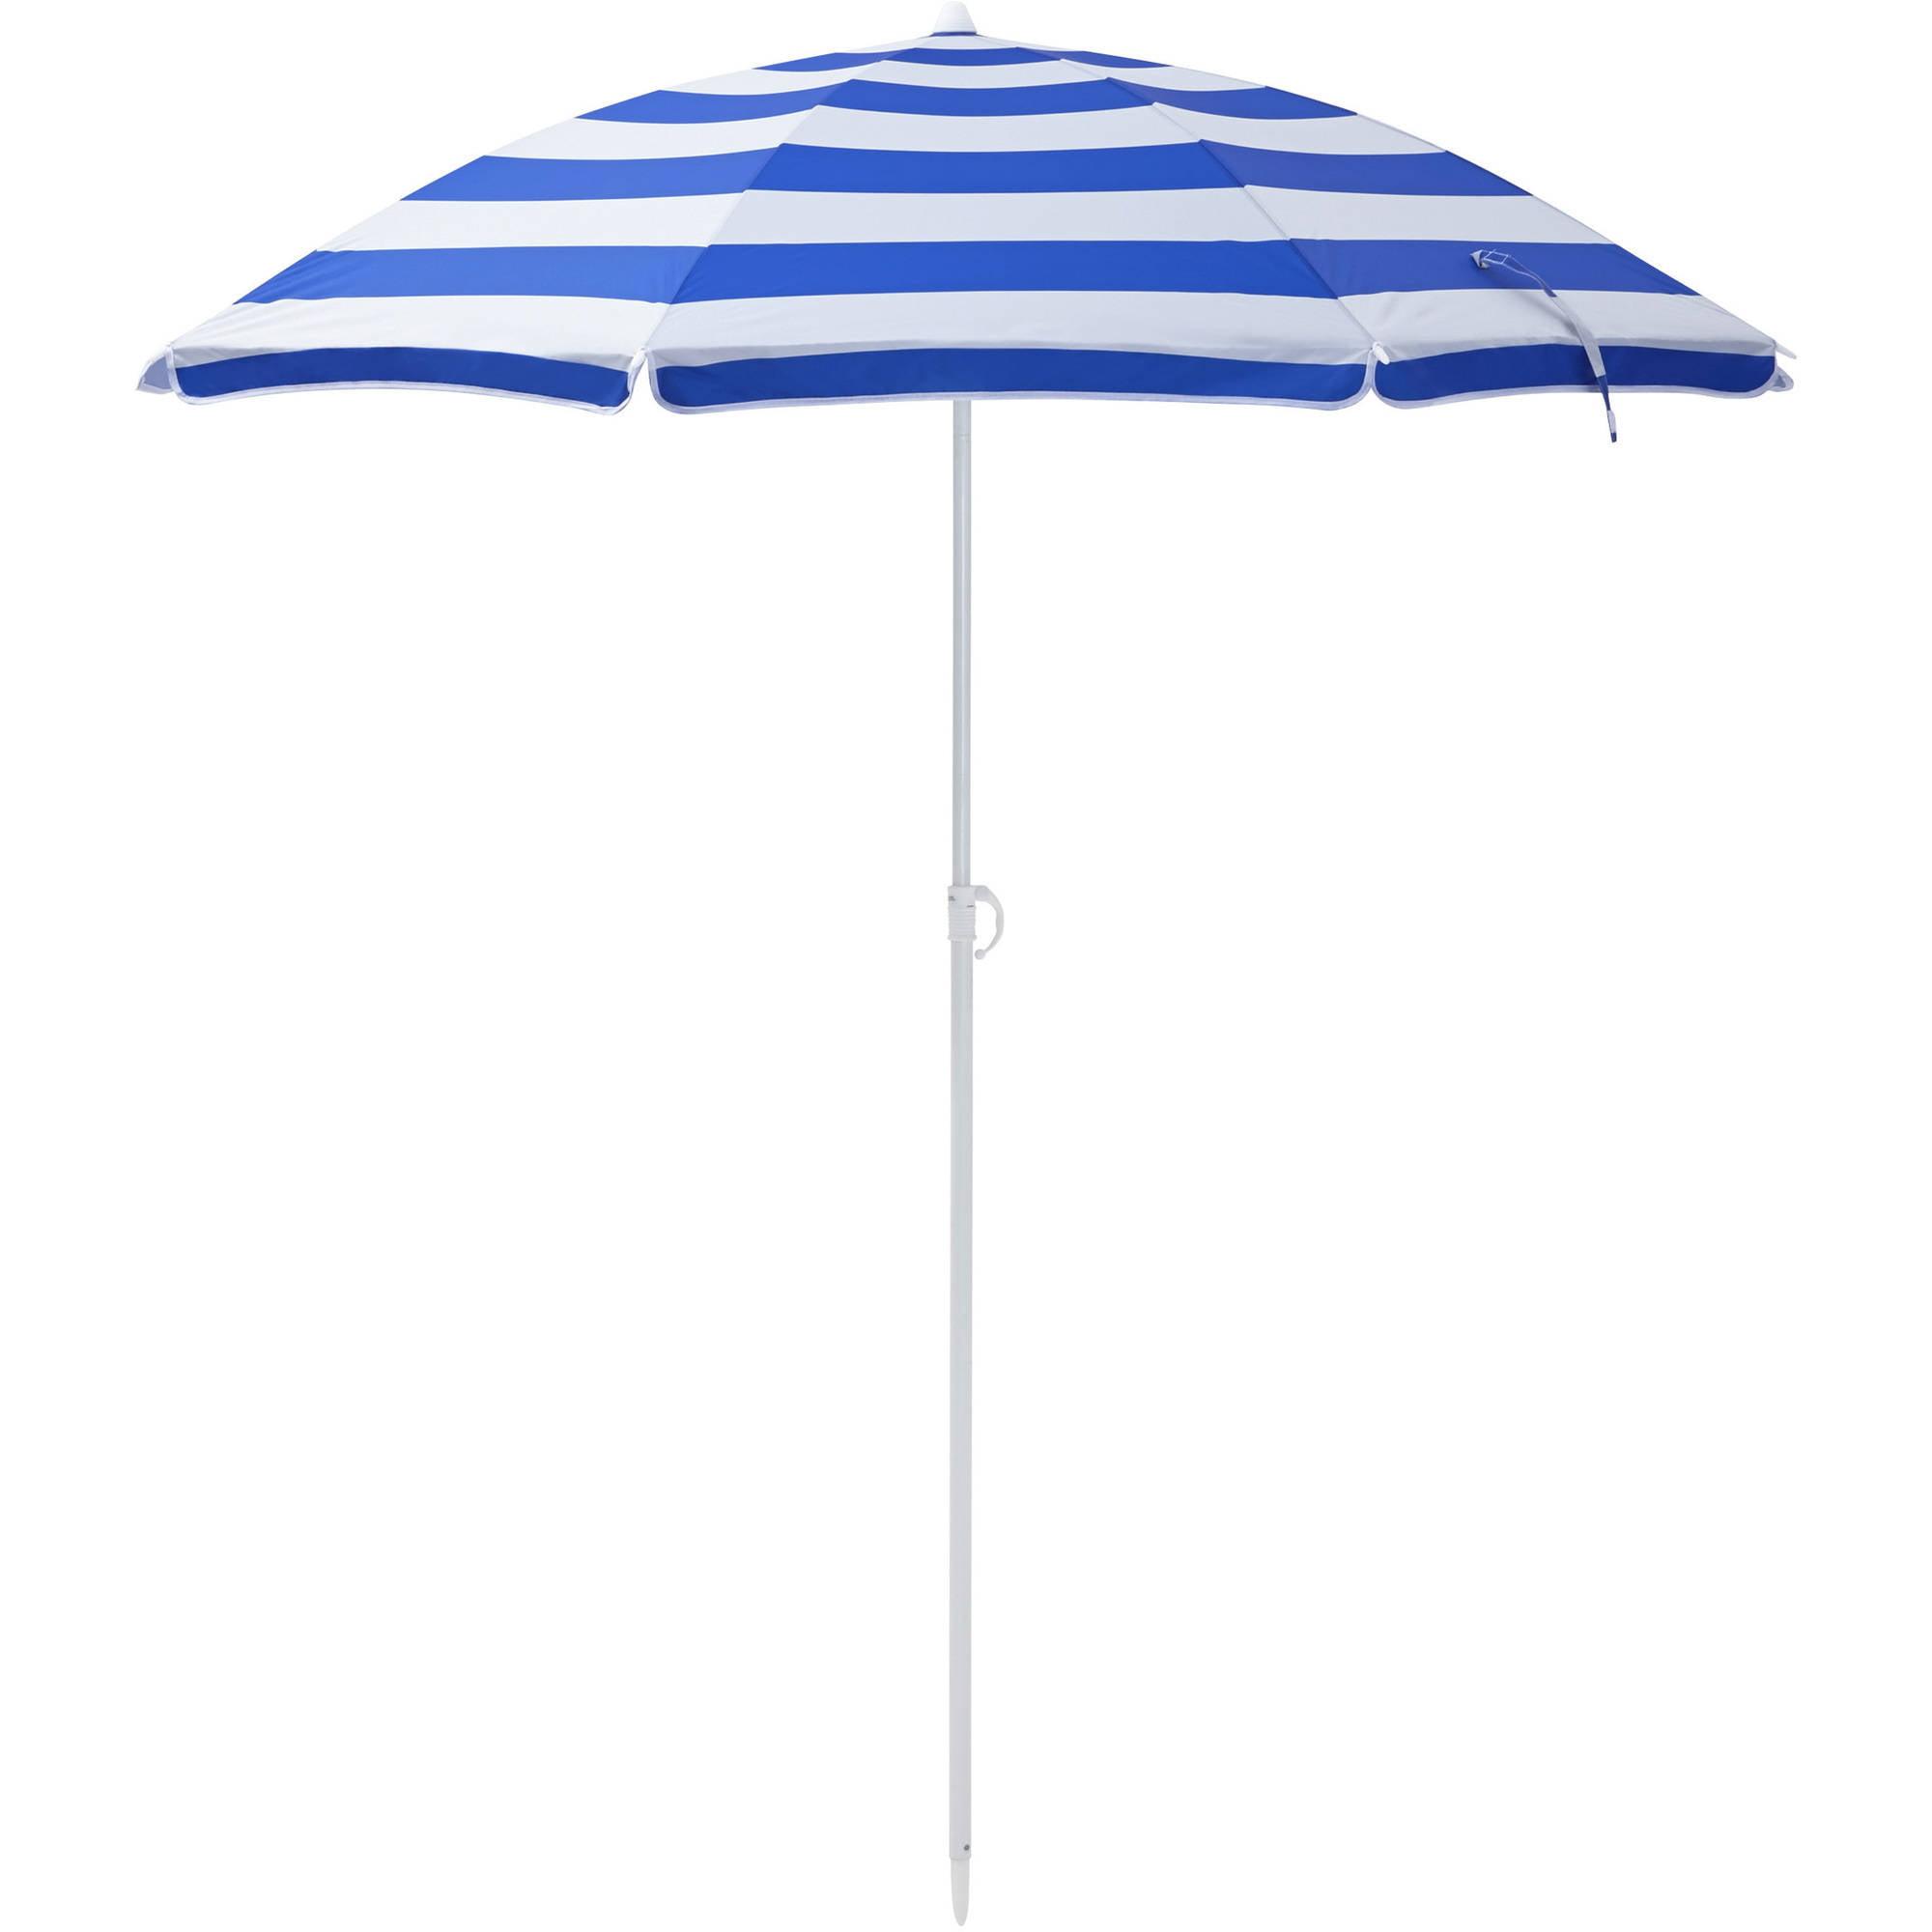 Mainstays 6 OPP Beach Umbrella Assortment